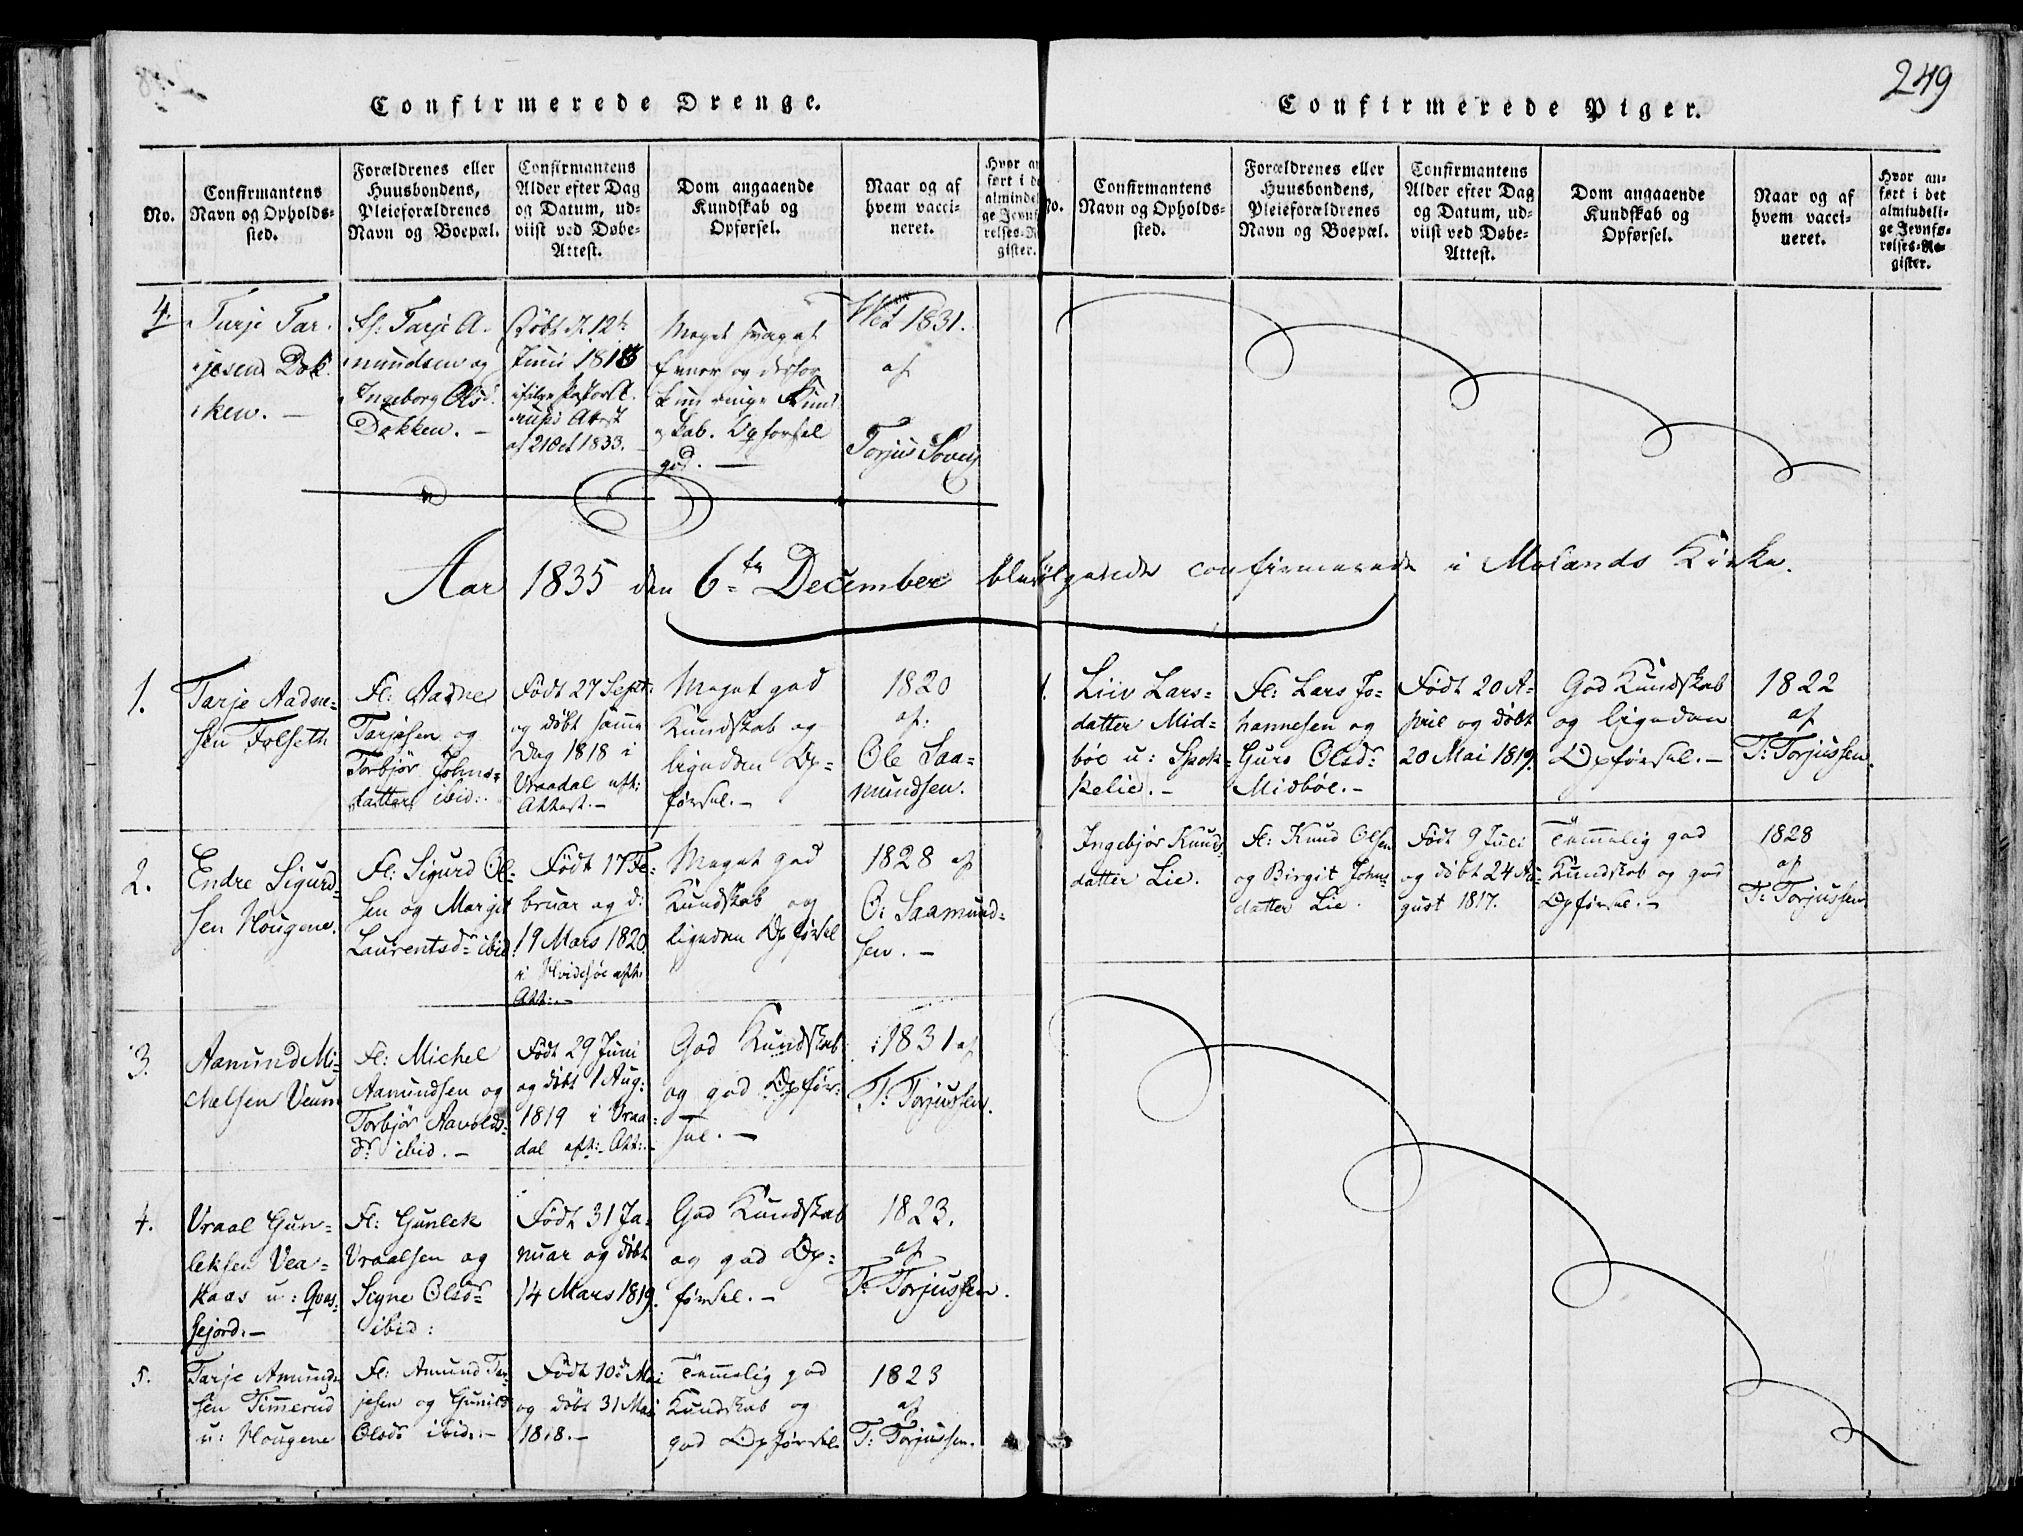 SAKO, Fyresdal kirkebøker, F/Fb/L0001: Ministerialbok nr. II 1, 1815-1854, s. 249